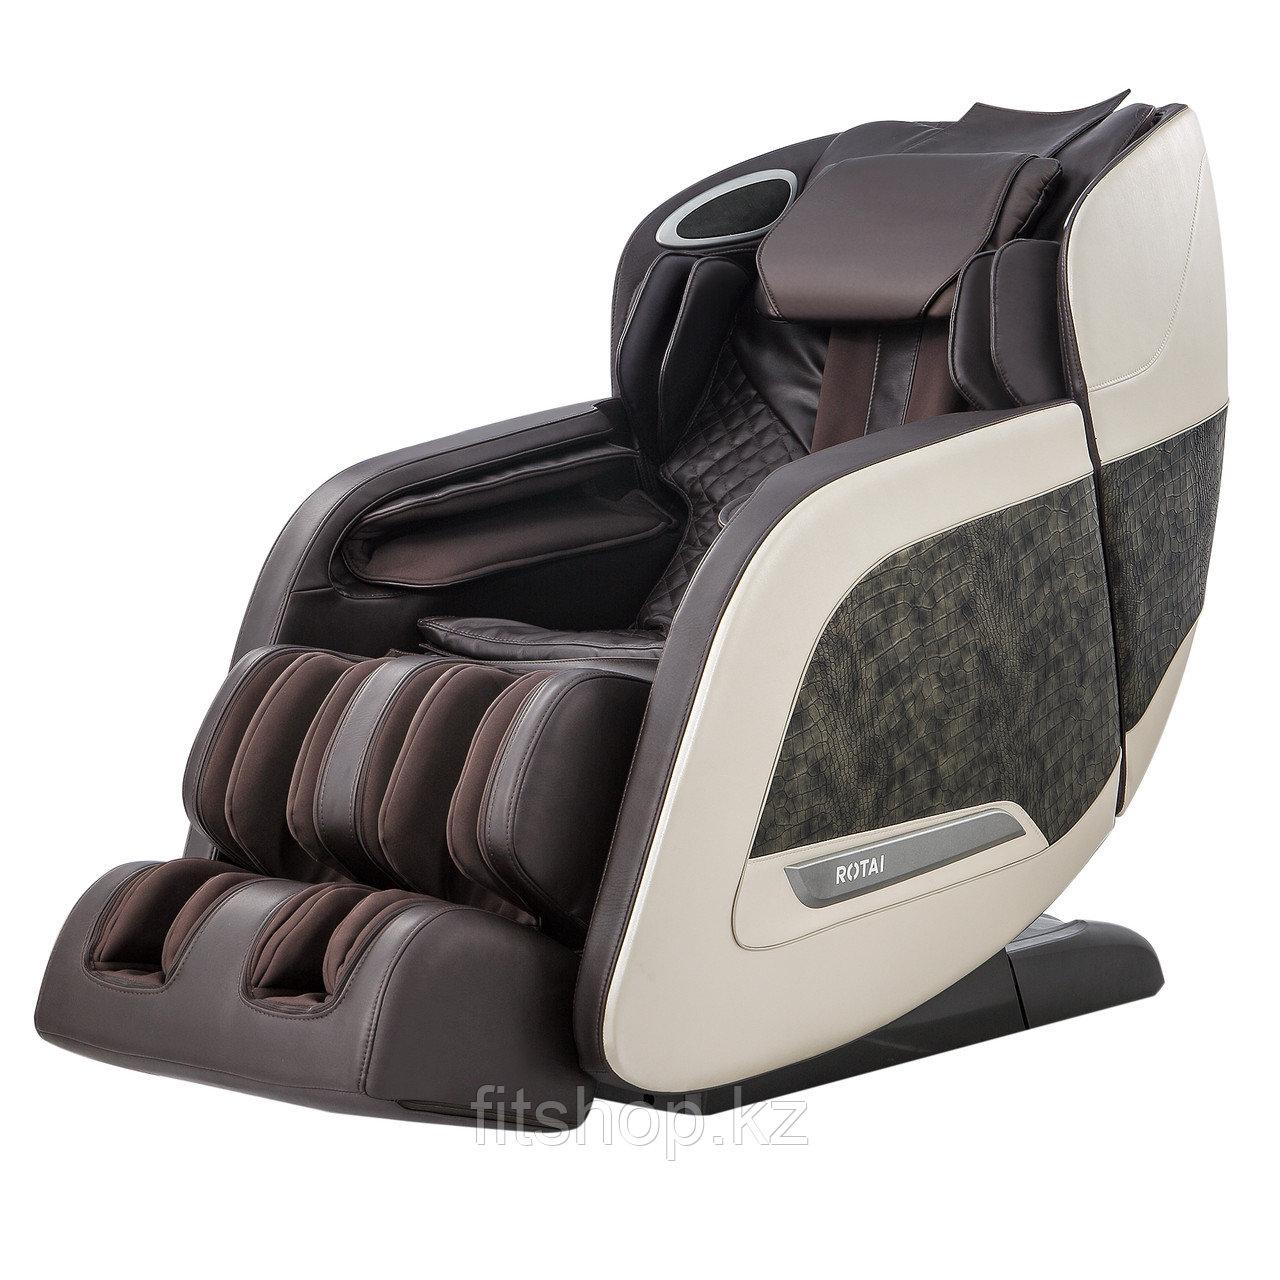 Массажное кресло Rongtai 6602